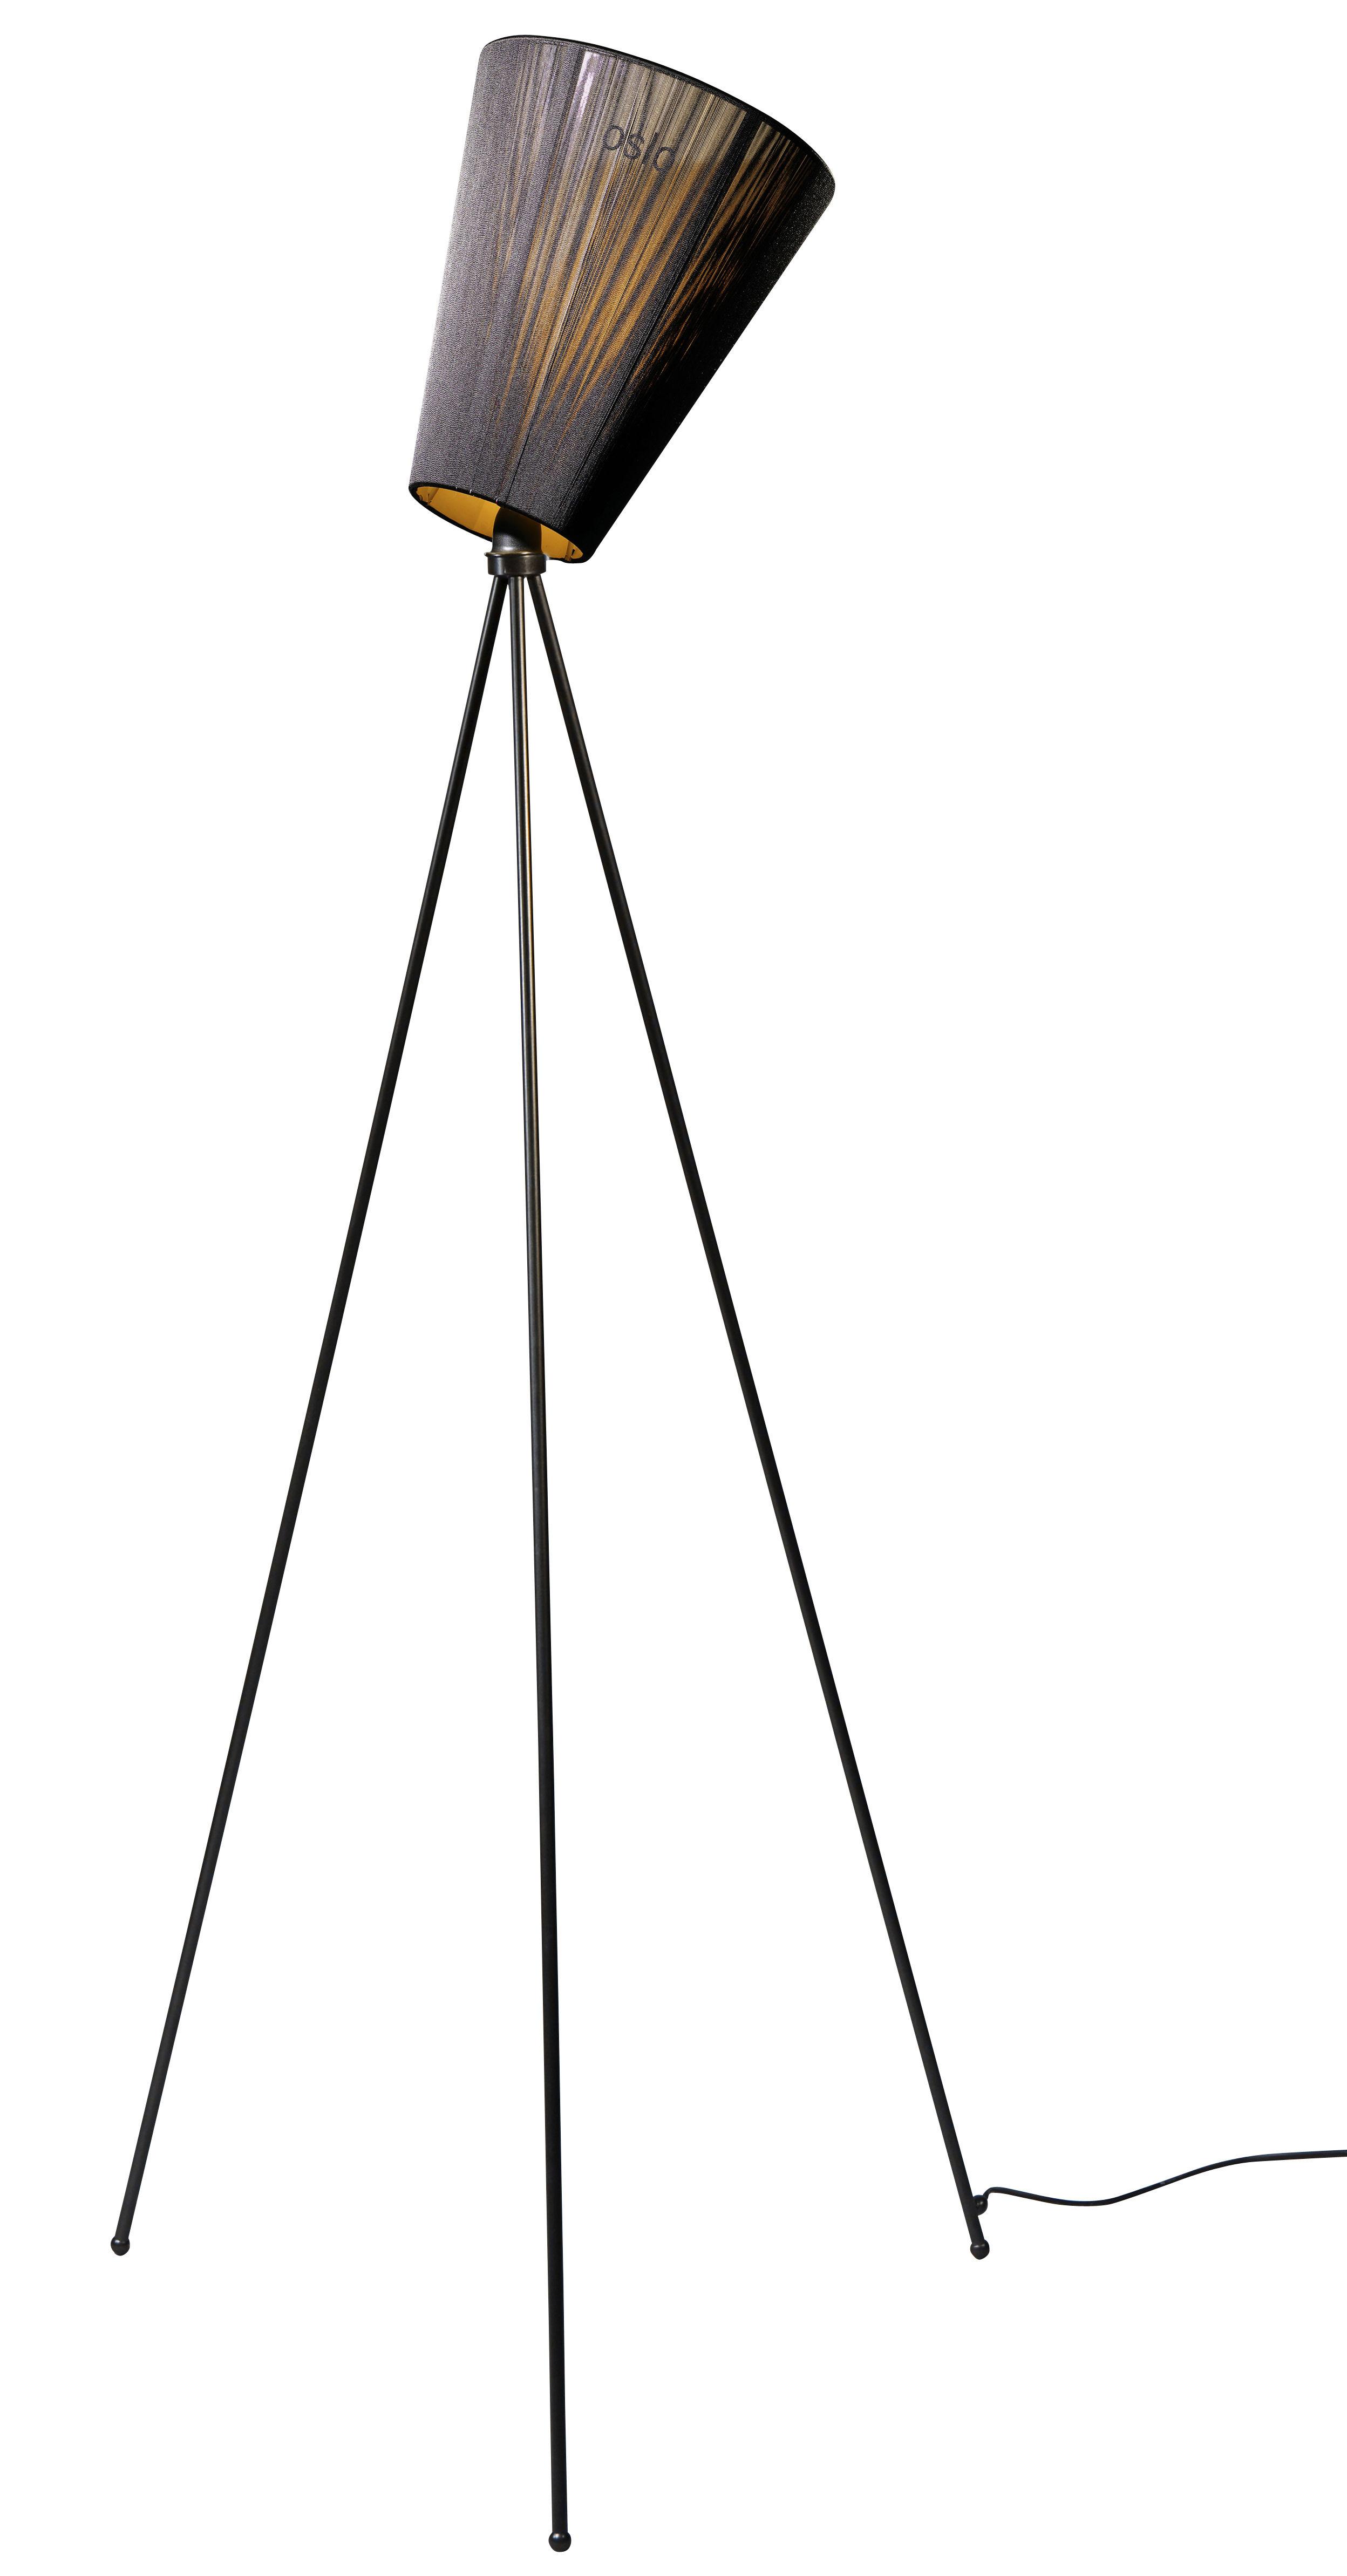 Luminaire - Lampadaires - Lampadaire Oslo Wood / Tissu & métal - Northern  - Tissu noir / pied noir - Acier peint, Tissu plissé